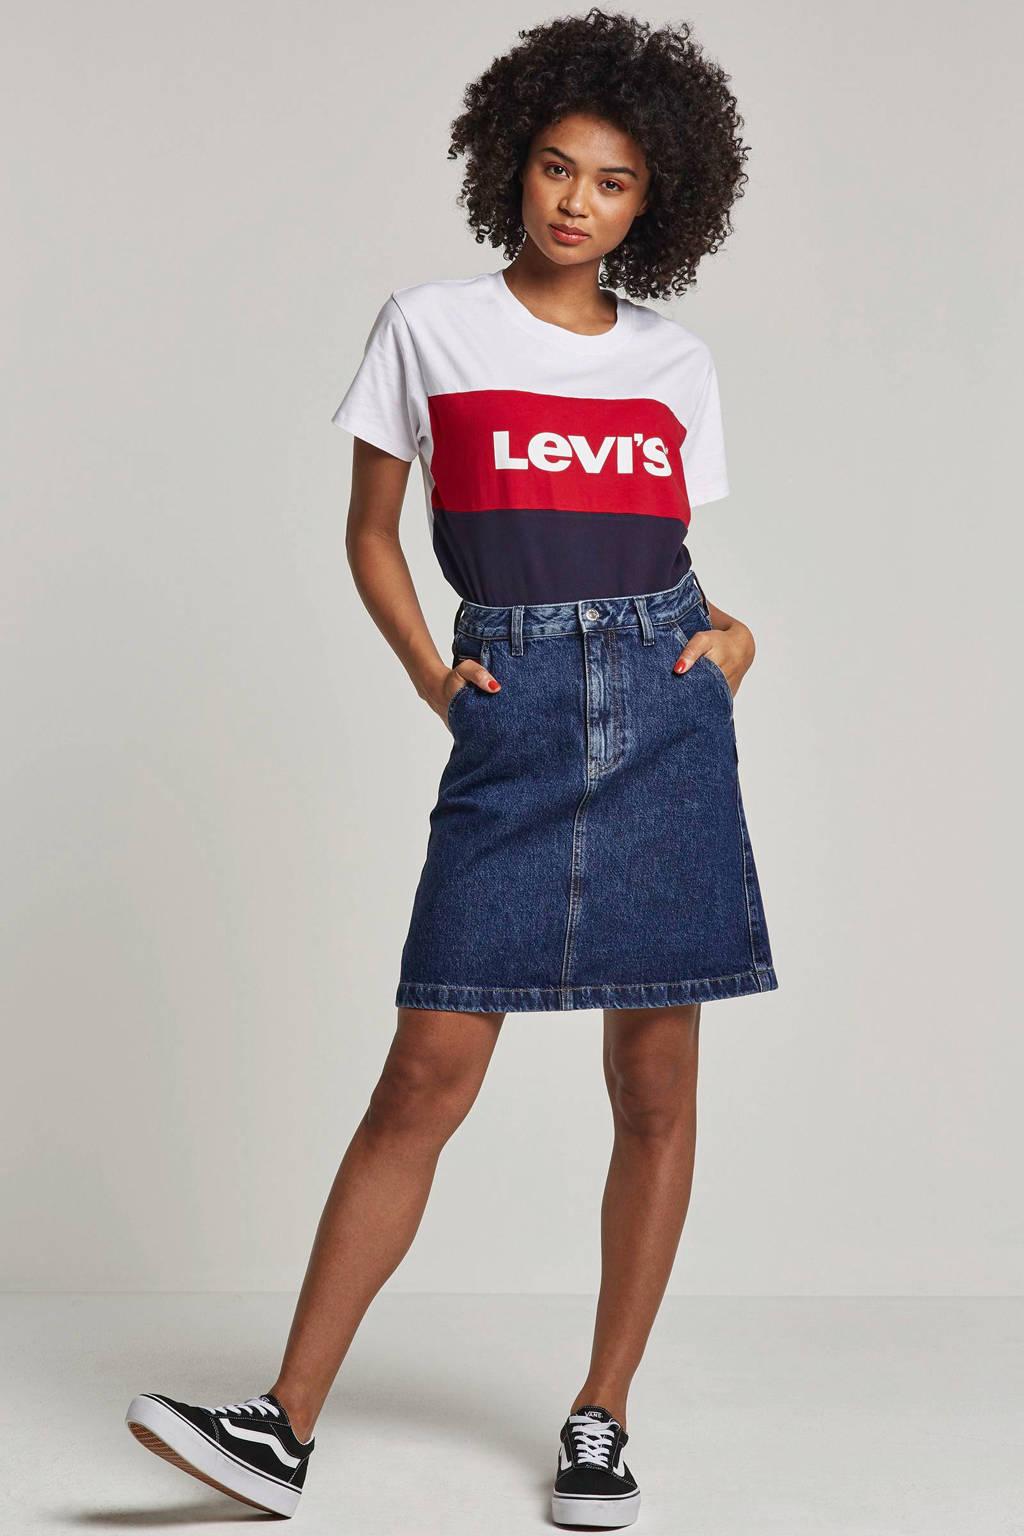 Levi's T-shirt met logo opdruk, Wit/blauw/rood